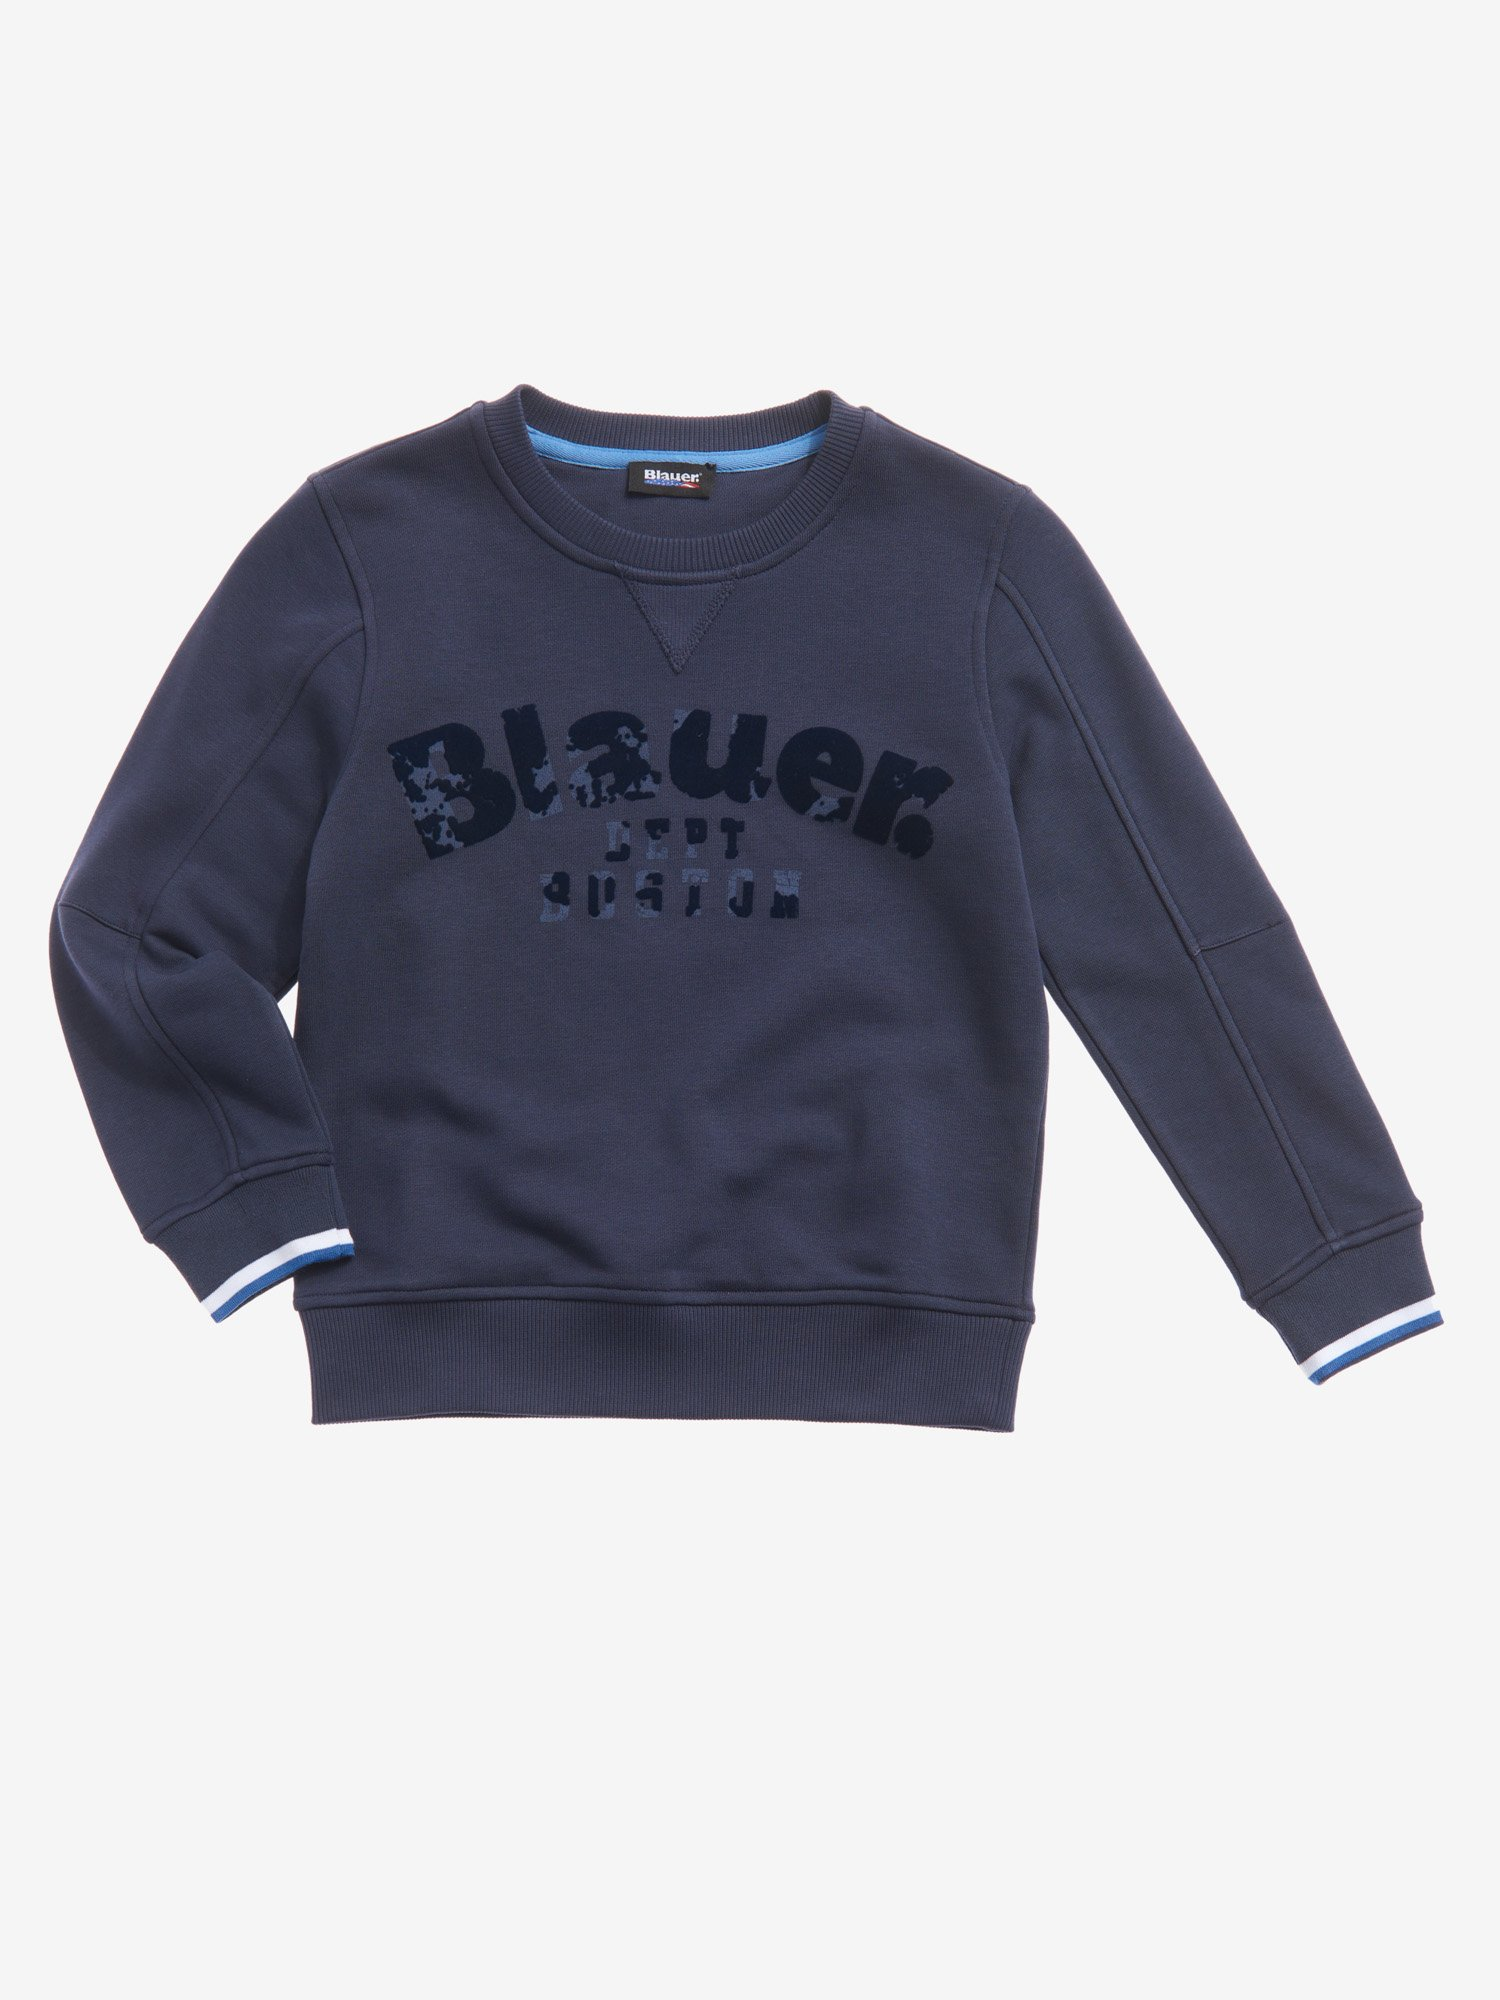 Blauer - SWEAT-SHIRT POUR GARÇON COL ROND - Dark Sapphire - Blauer